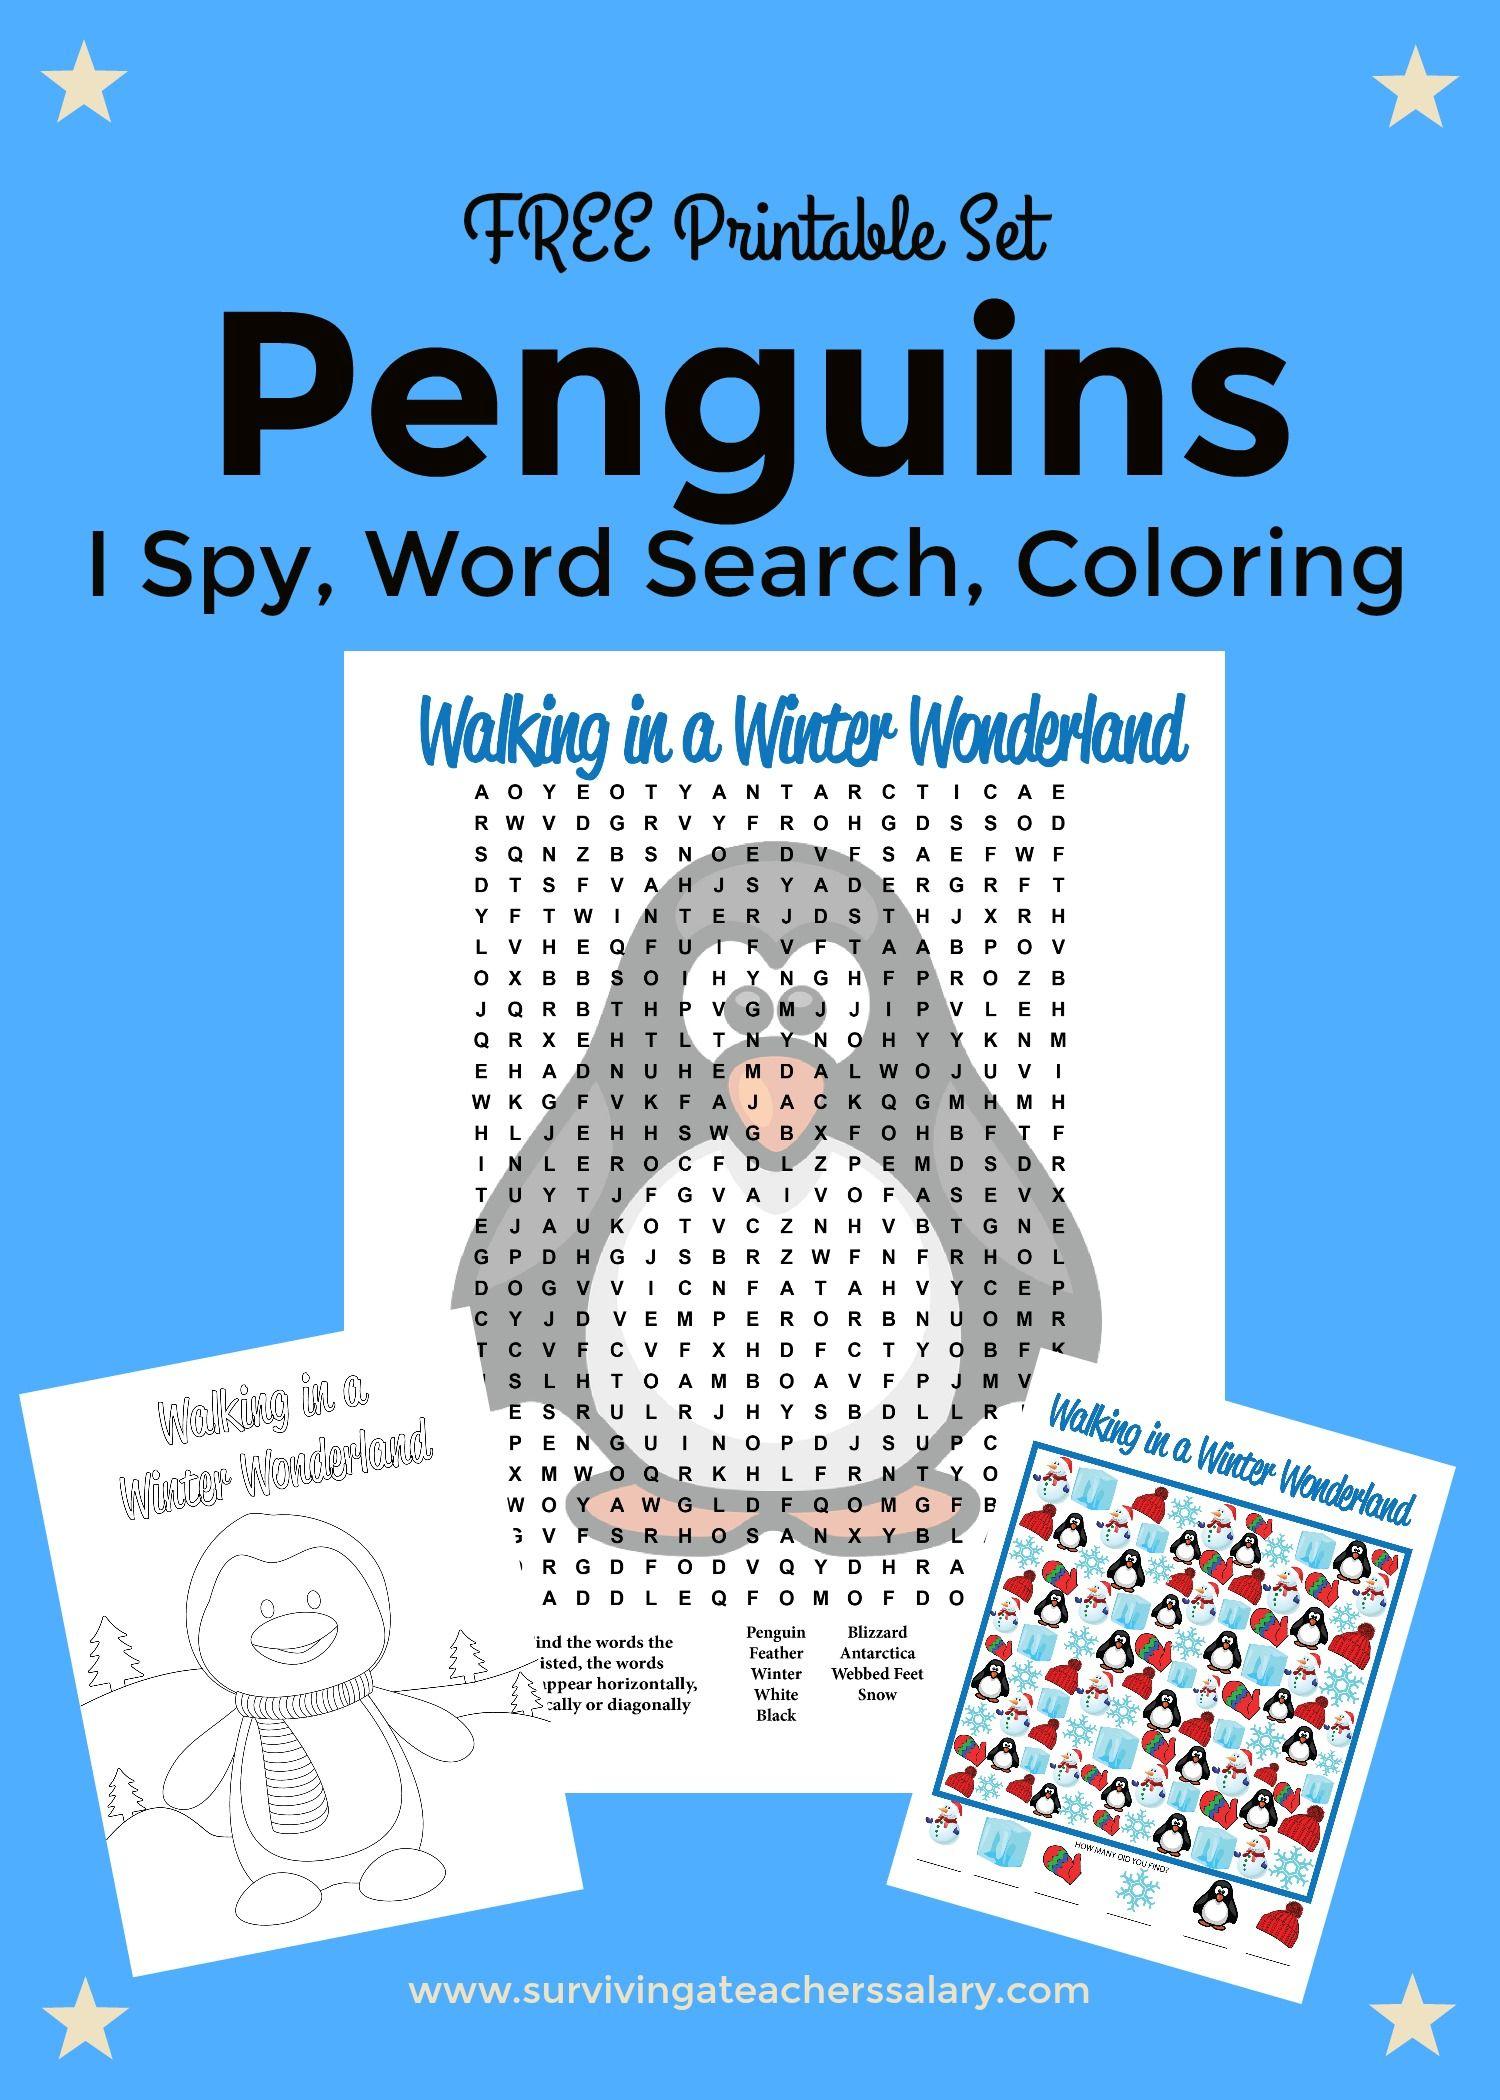 Free Printable Penguins Worksheets Coloring Sheet Word Search I Spy Penguin Worksheets Penguin Classroom Theme Penguin Activities [ 2100 x 1500 Pixel ]